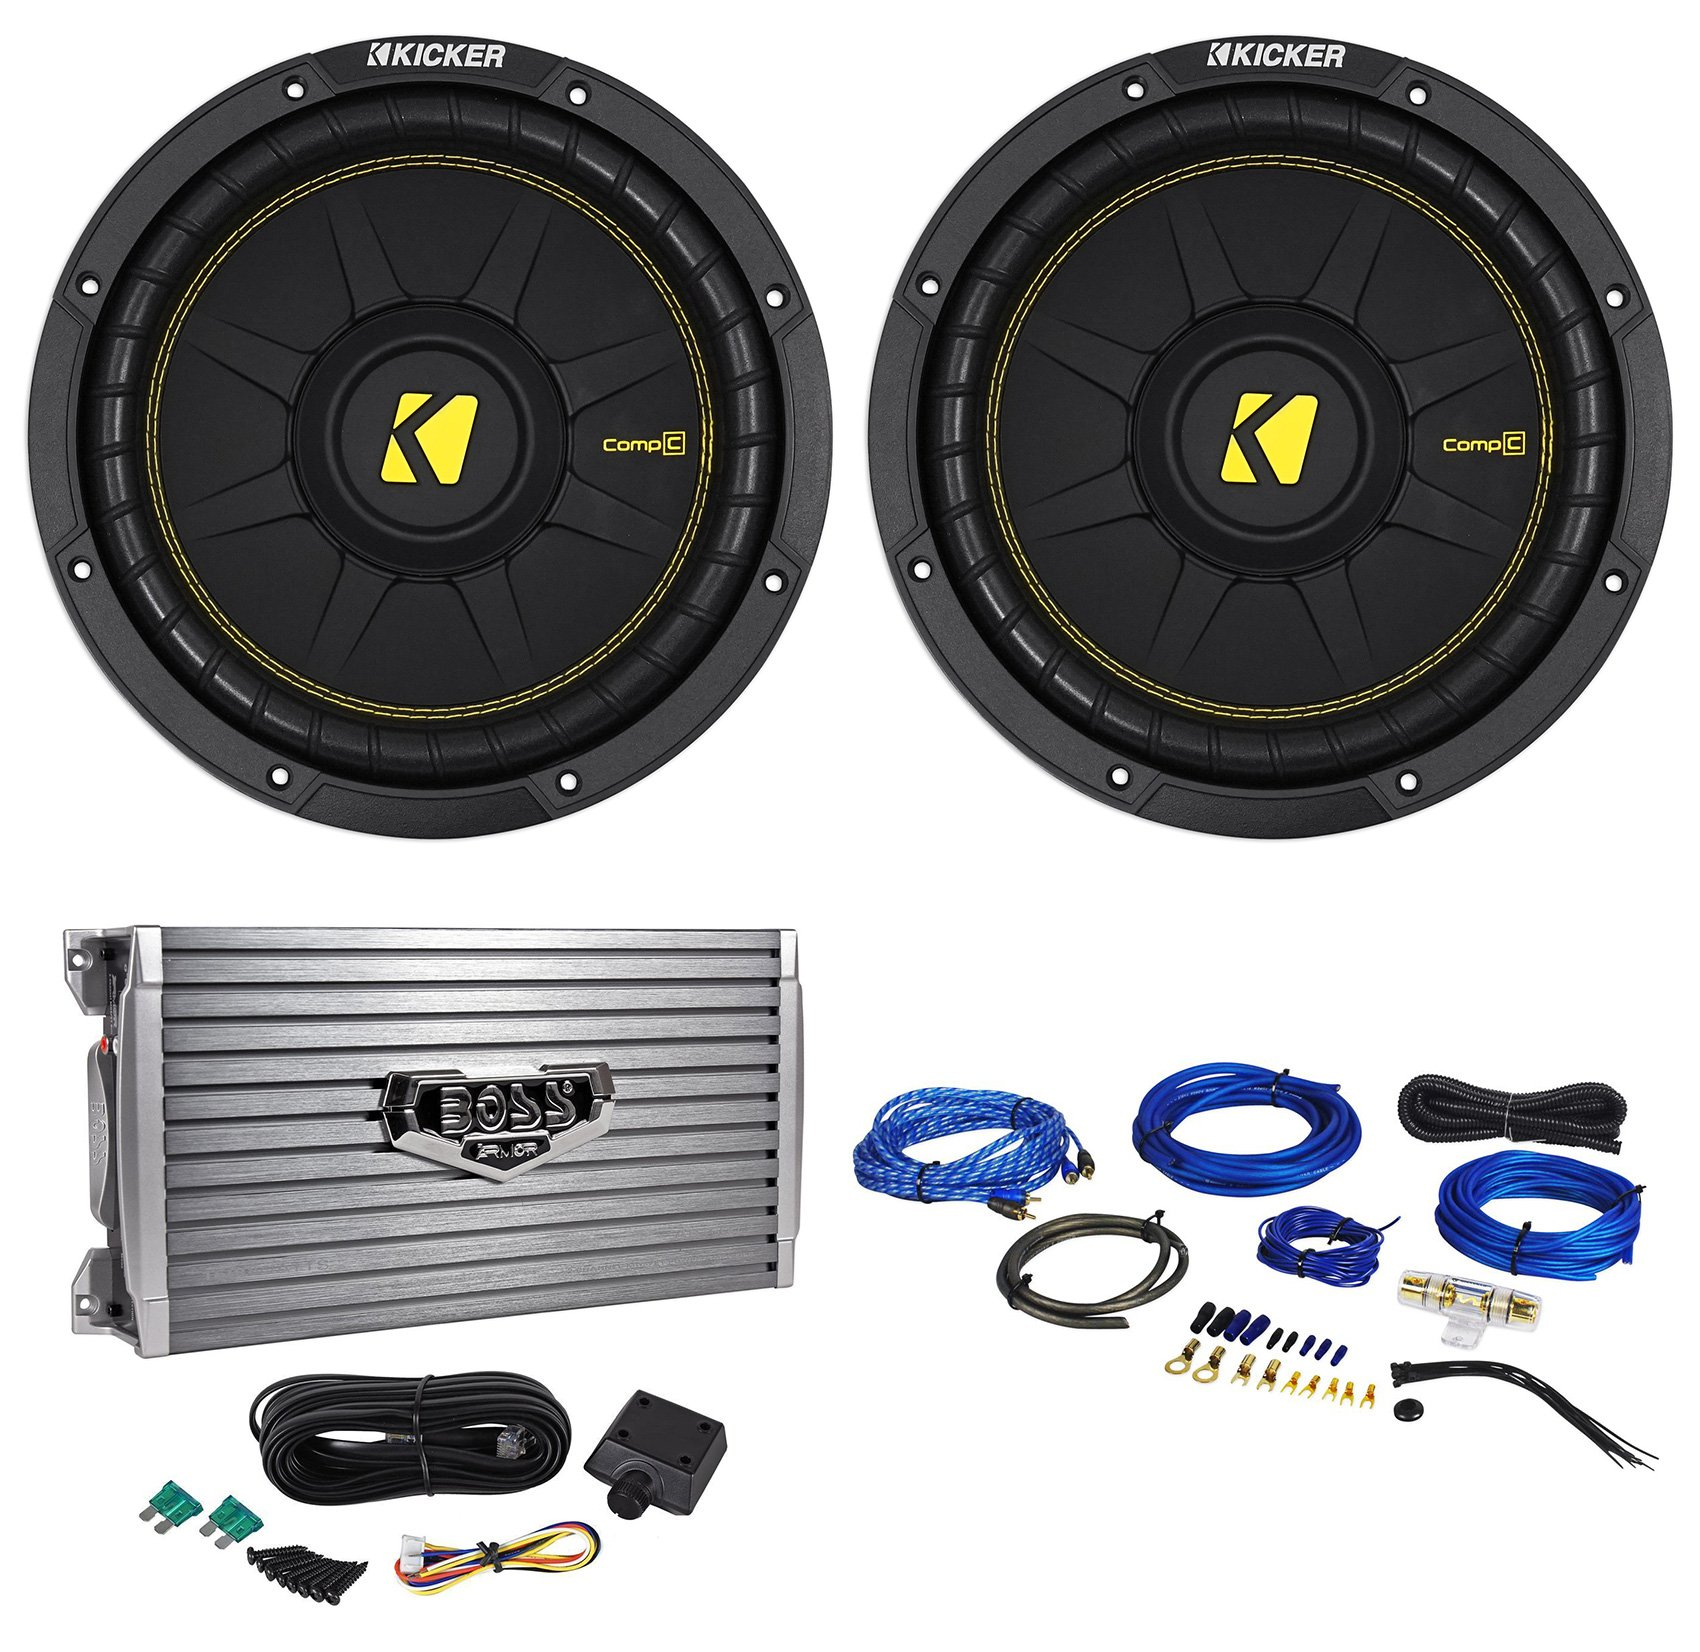 (2) Kicker 44CWCD104 CompC 10'' 1000W 4-Ohm DVC Car Subwoofers+Amplifier+Wire Kit